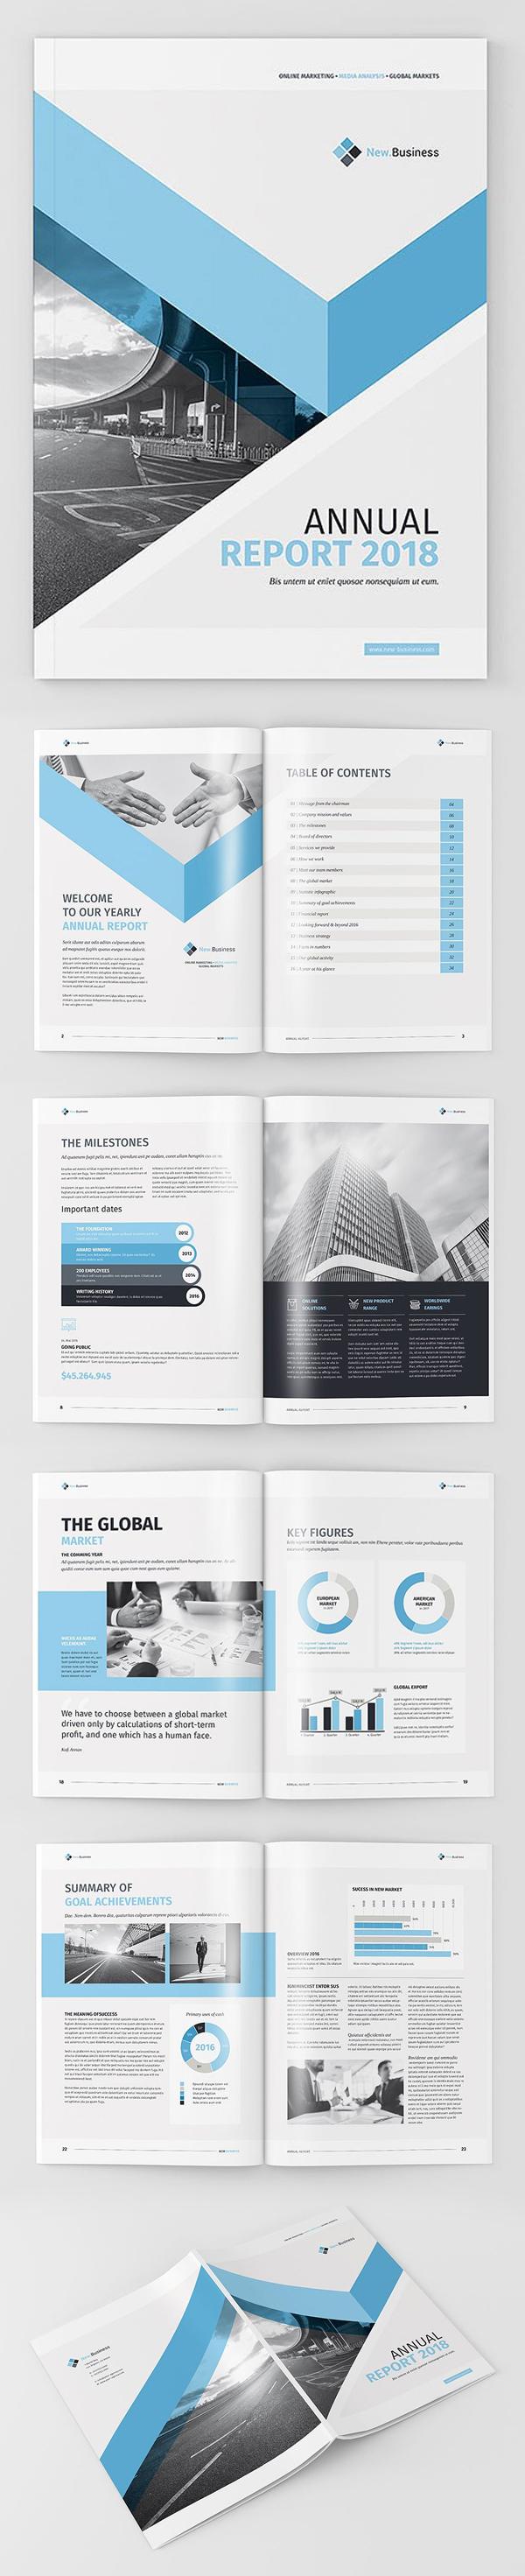 100 Professional Corporate Brochure Templates - 37